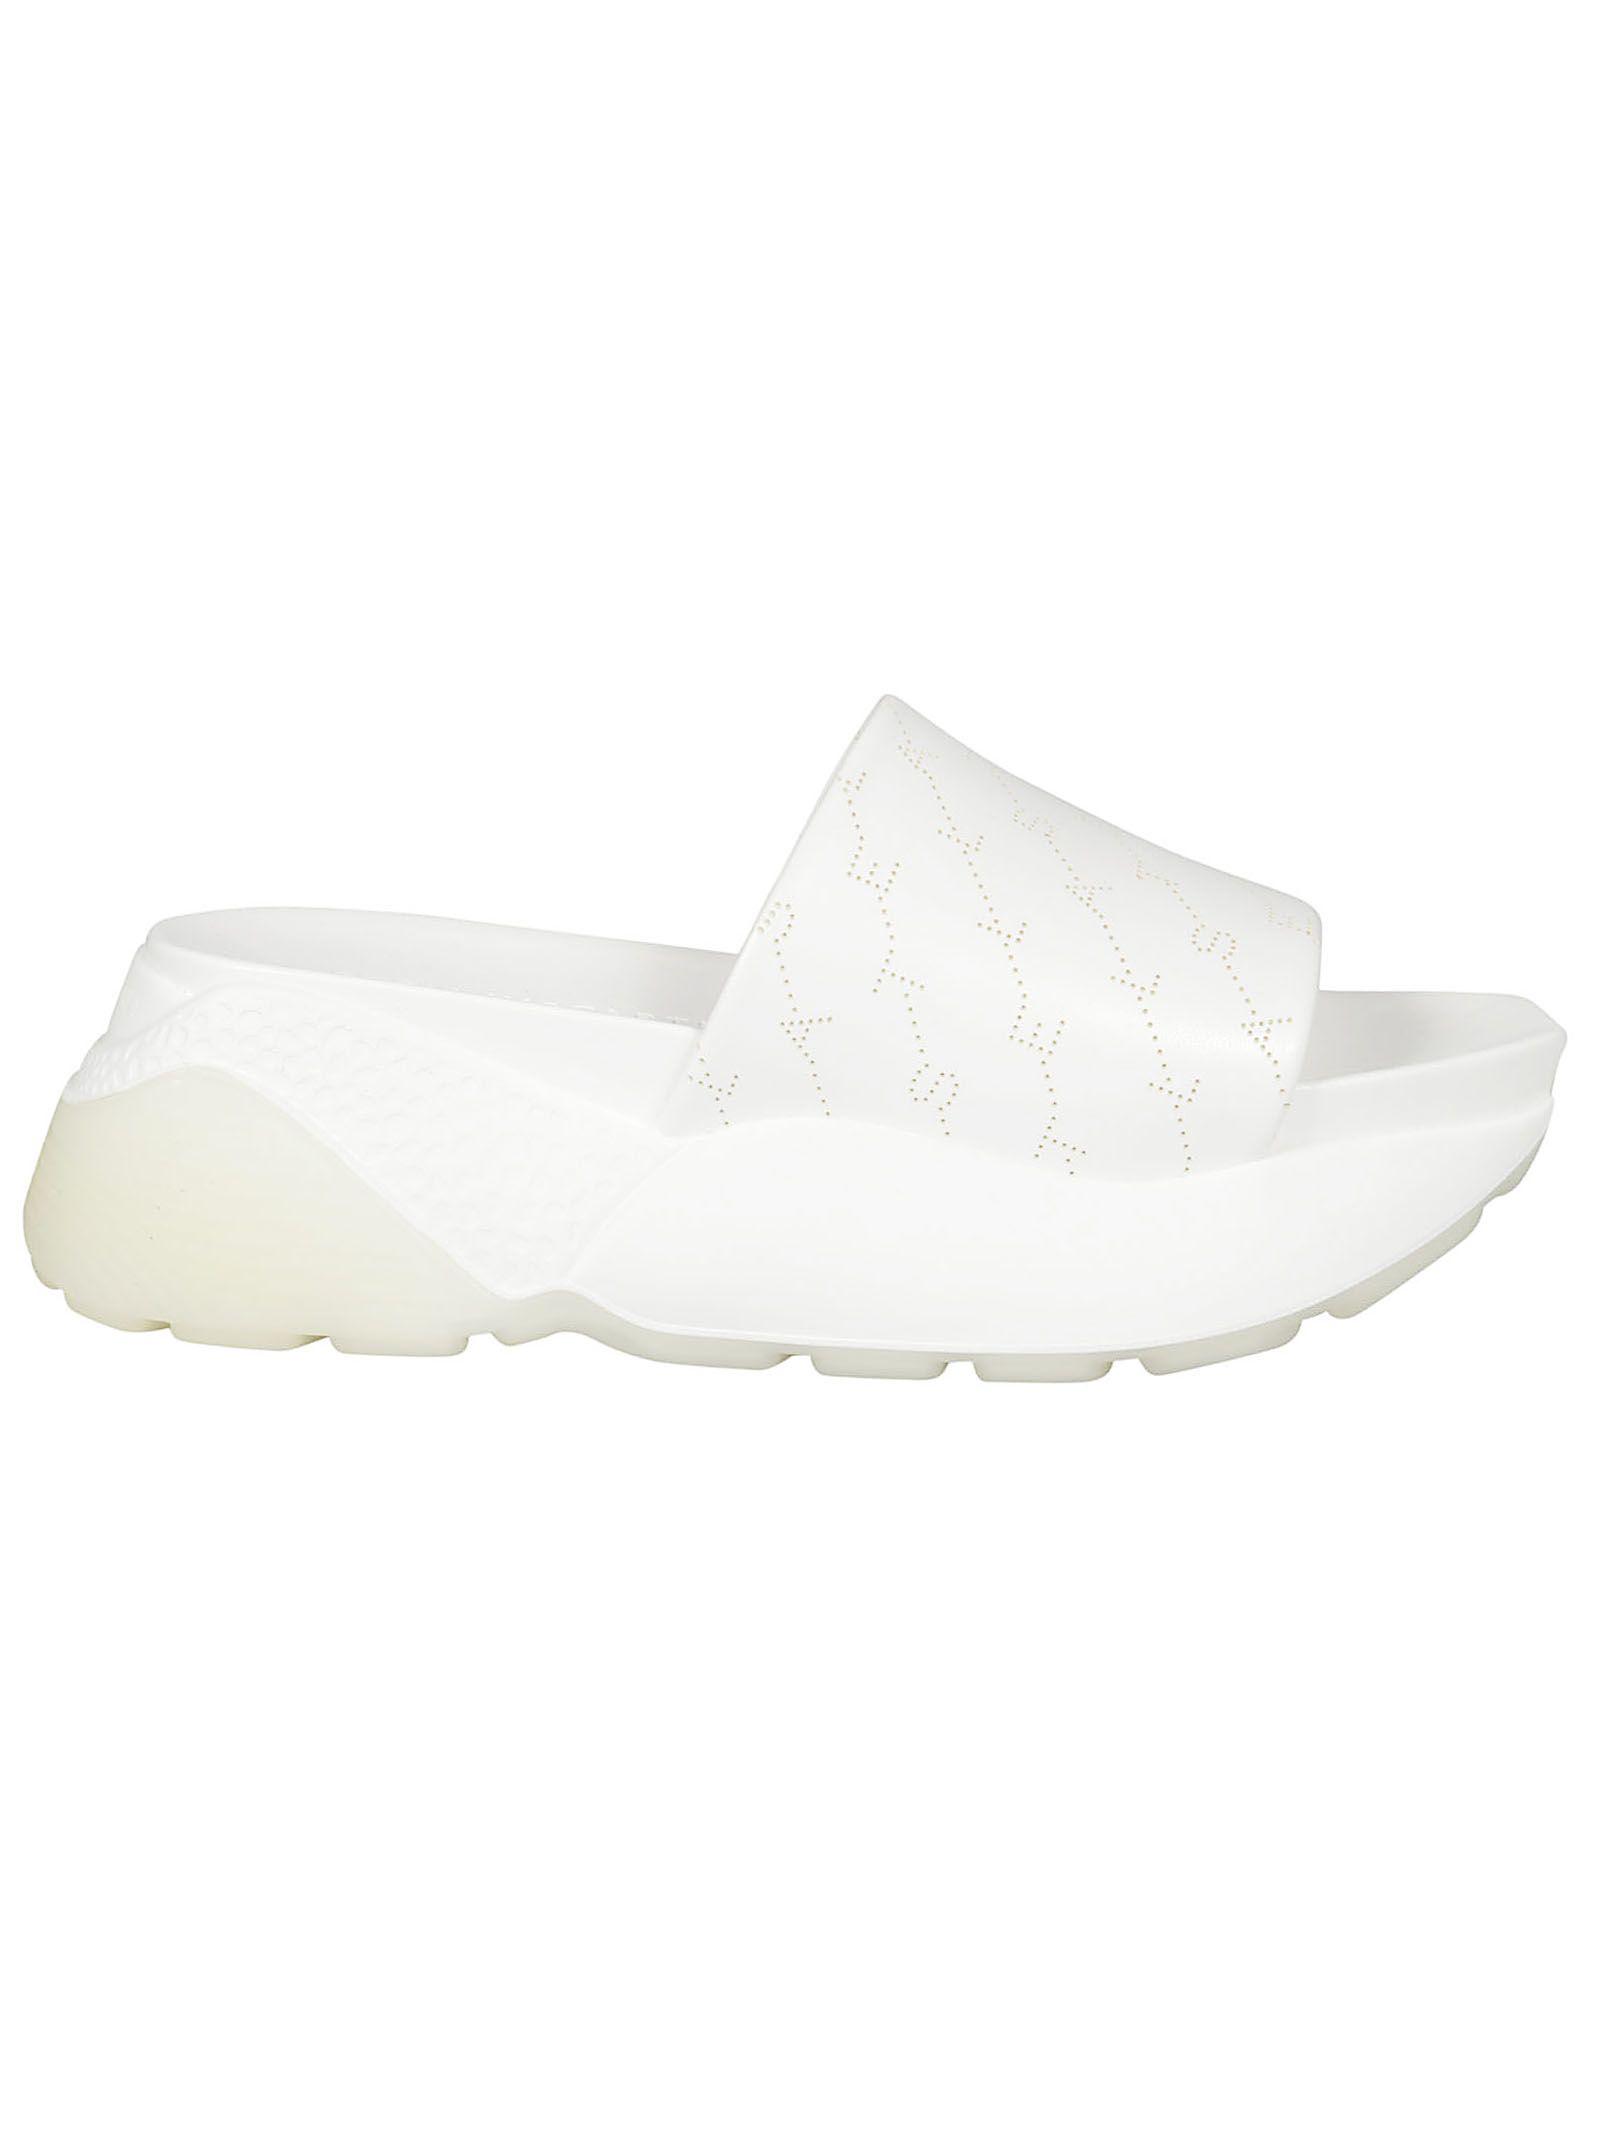 c0d58a487edd Stella Mccartney Women s Rubber Slippers Sandals Eclypse In White ...